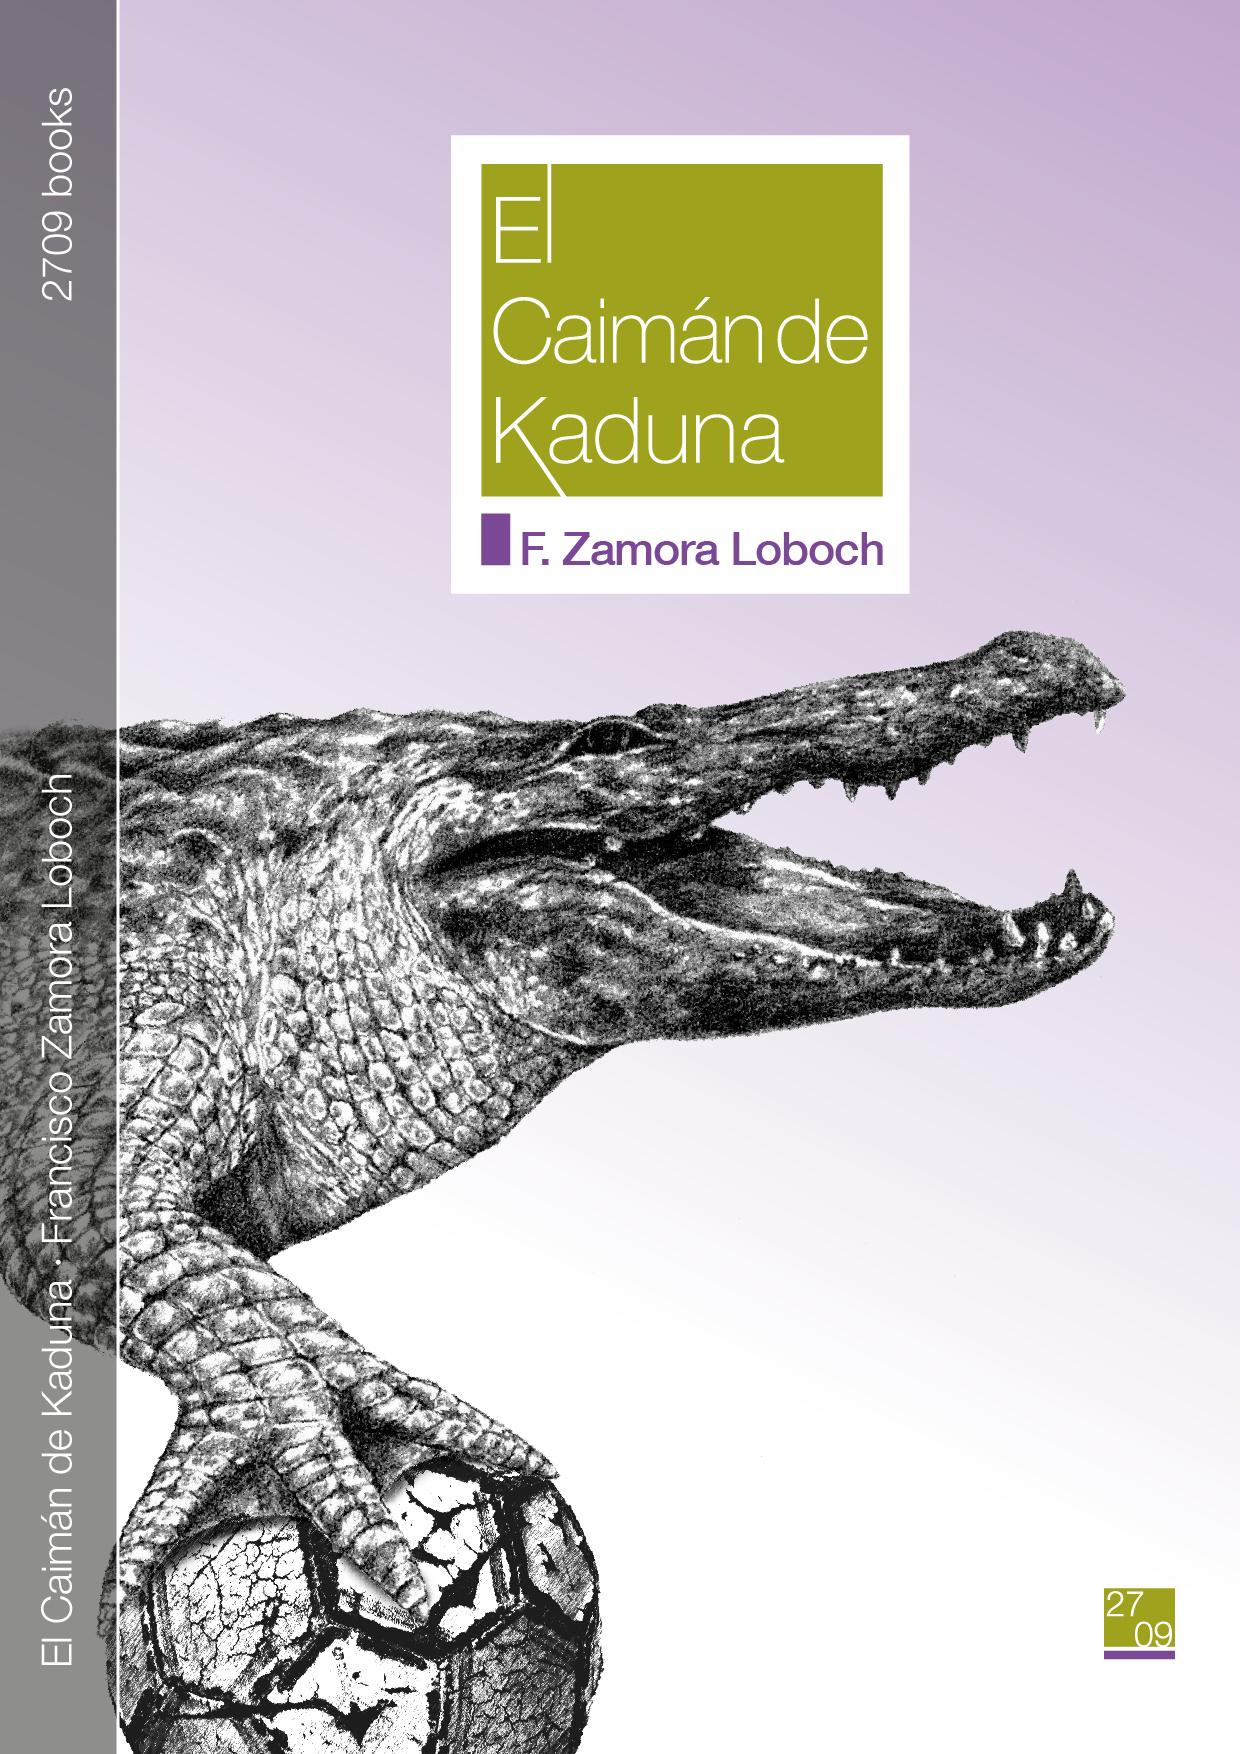 El Caimán de Kaduna de F. Zamora Loboch